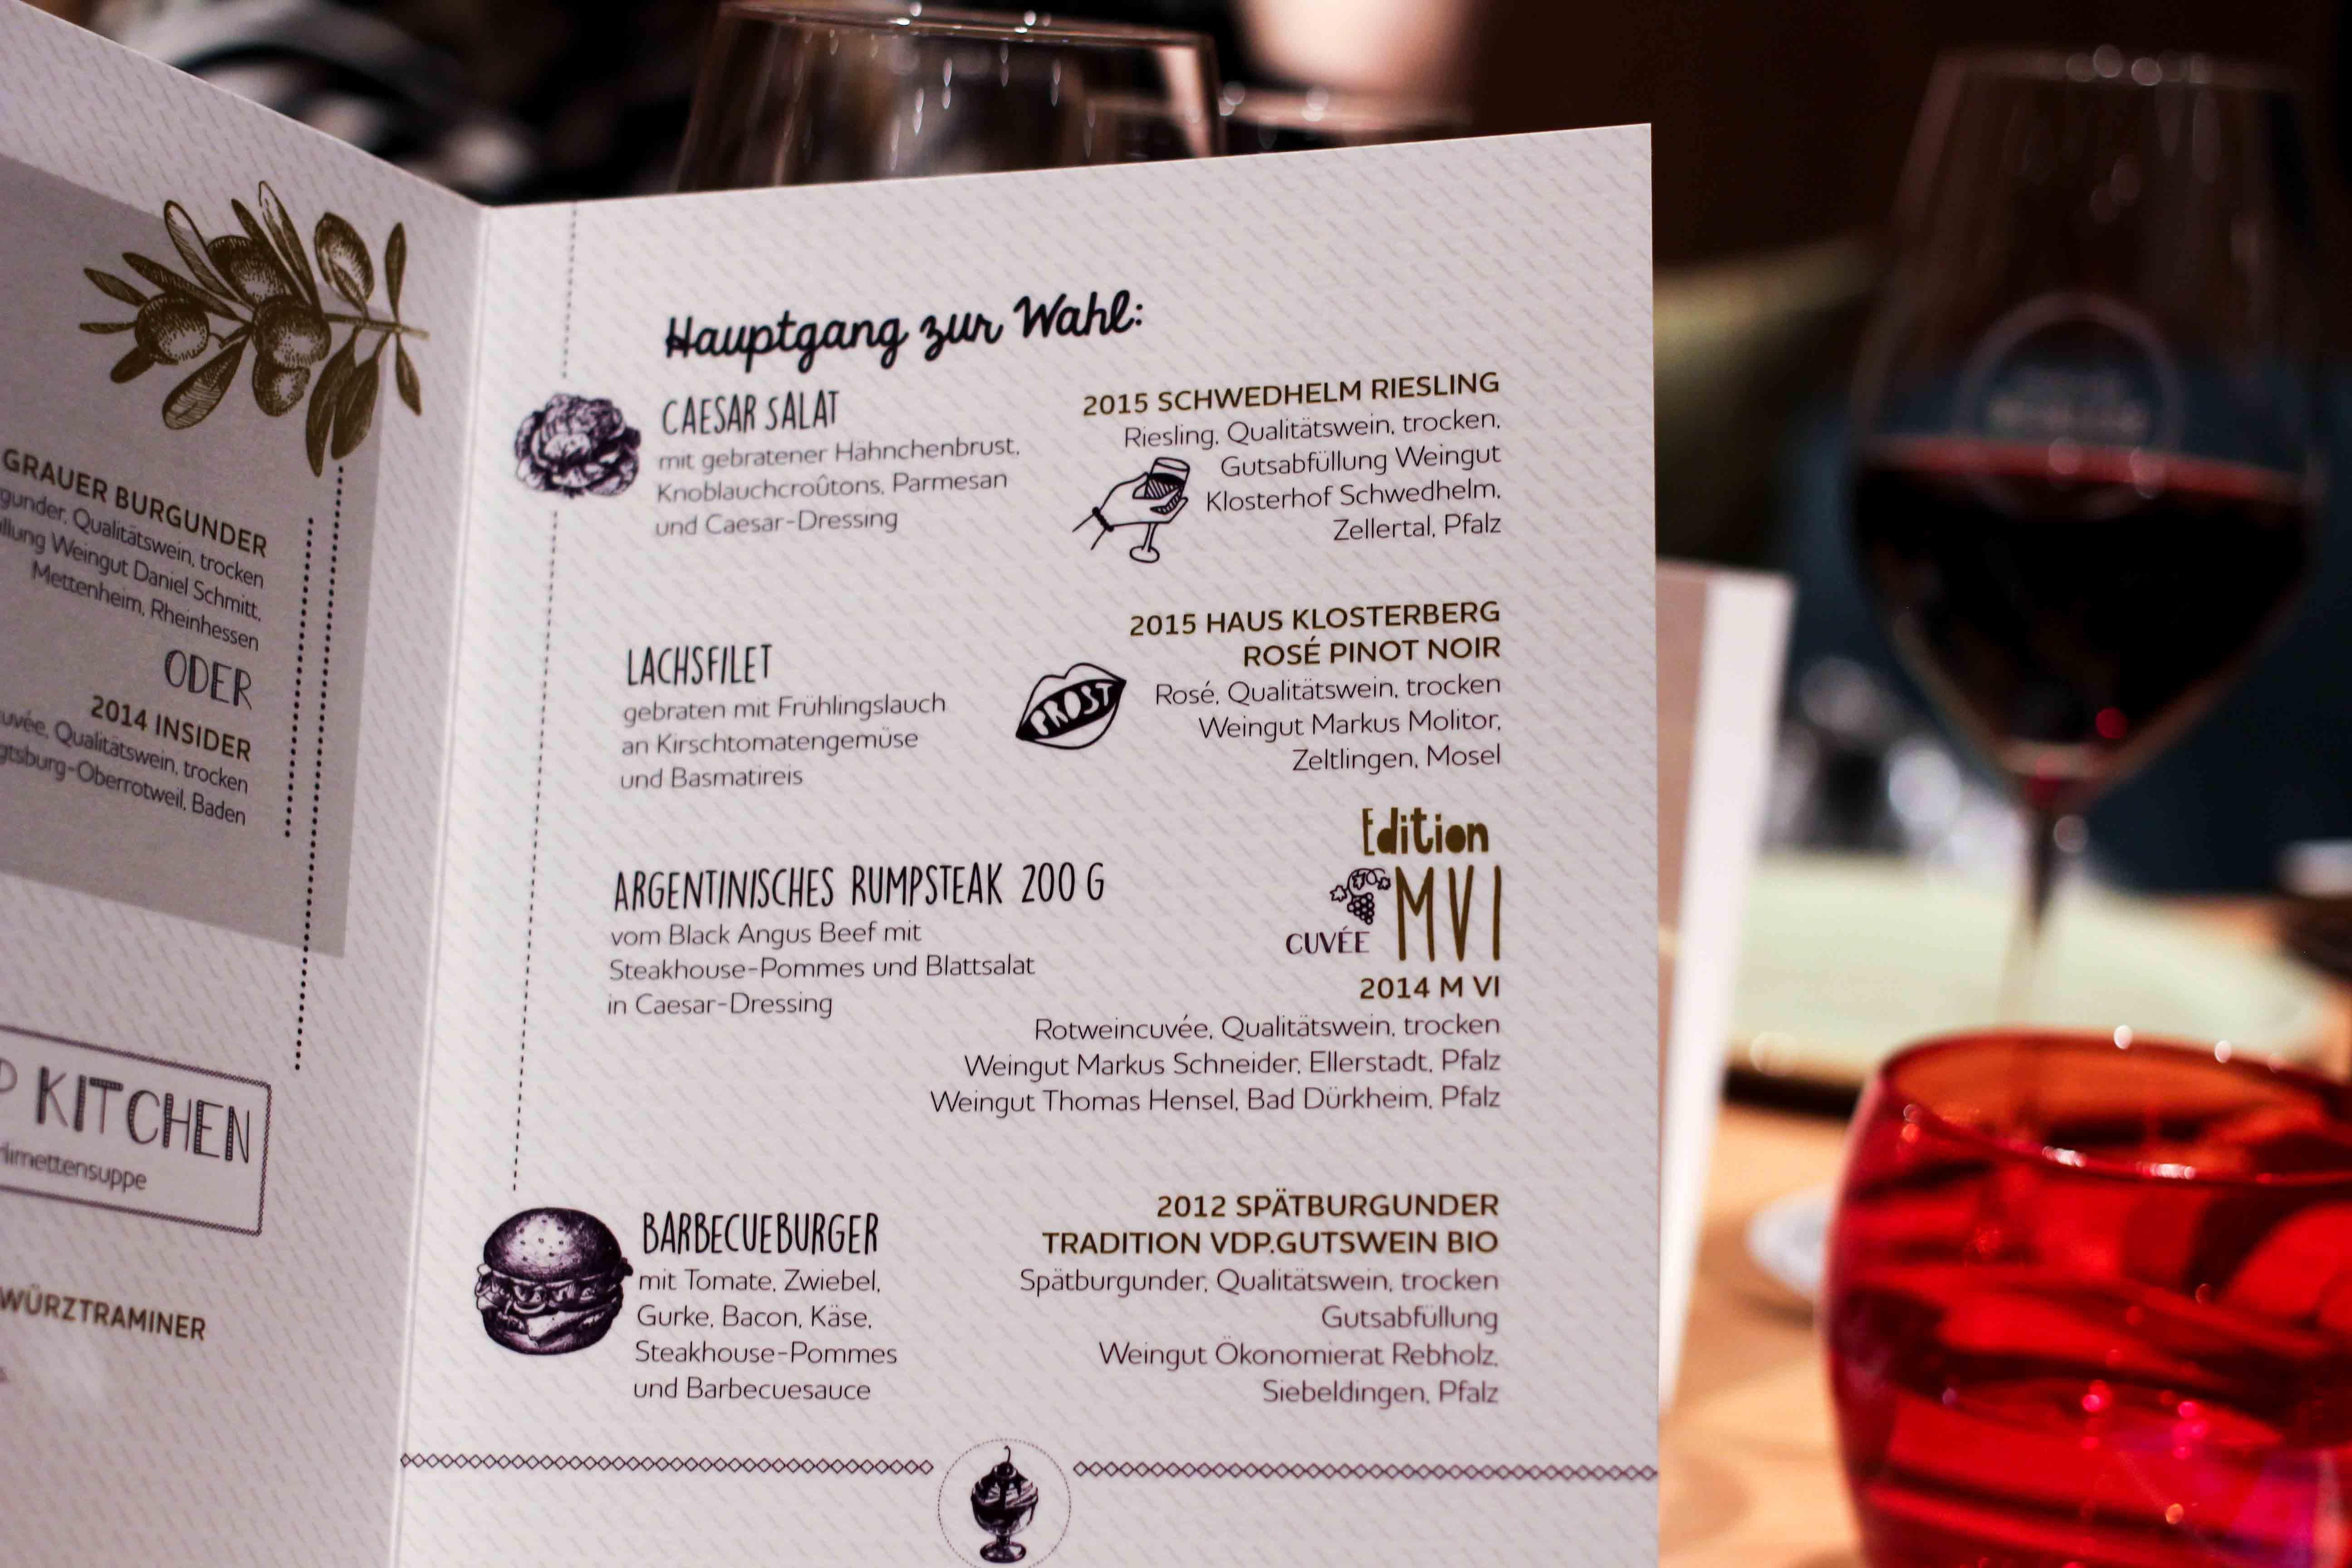 Mercure Weinlese Reiseblog Weinprobe Mercure Mannheim Speisekarte Blogger